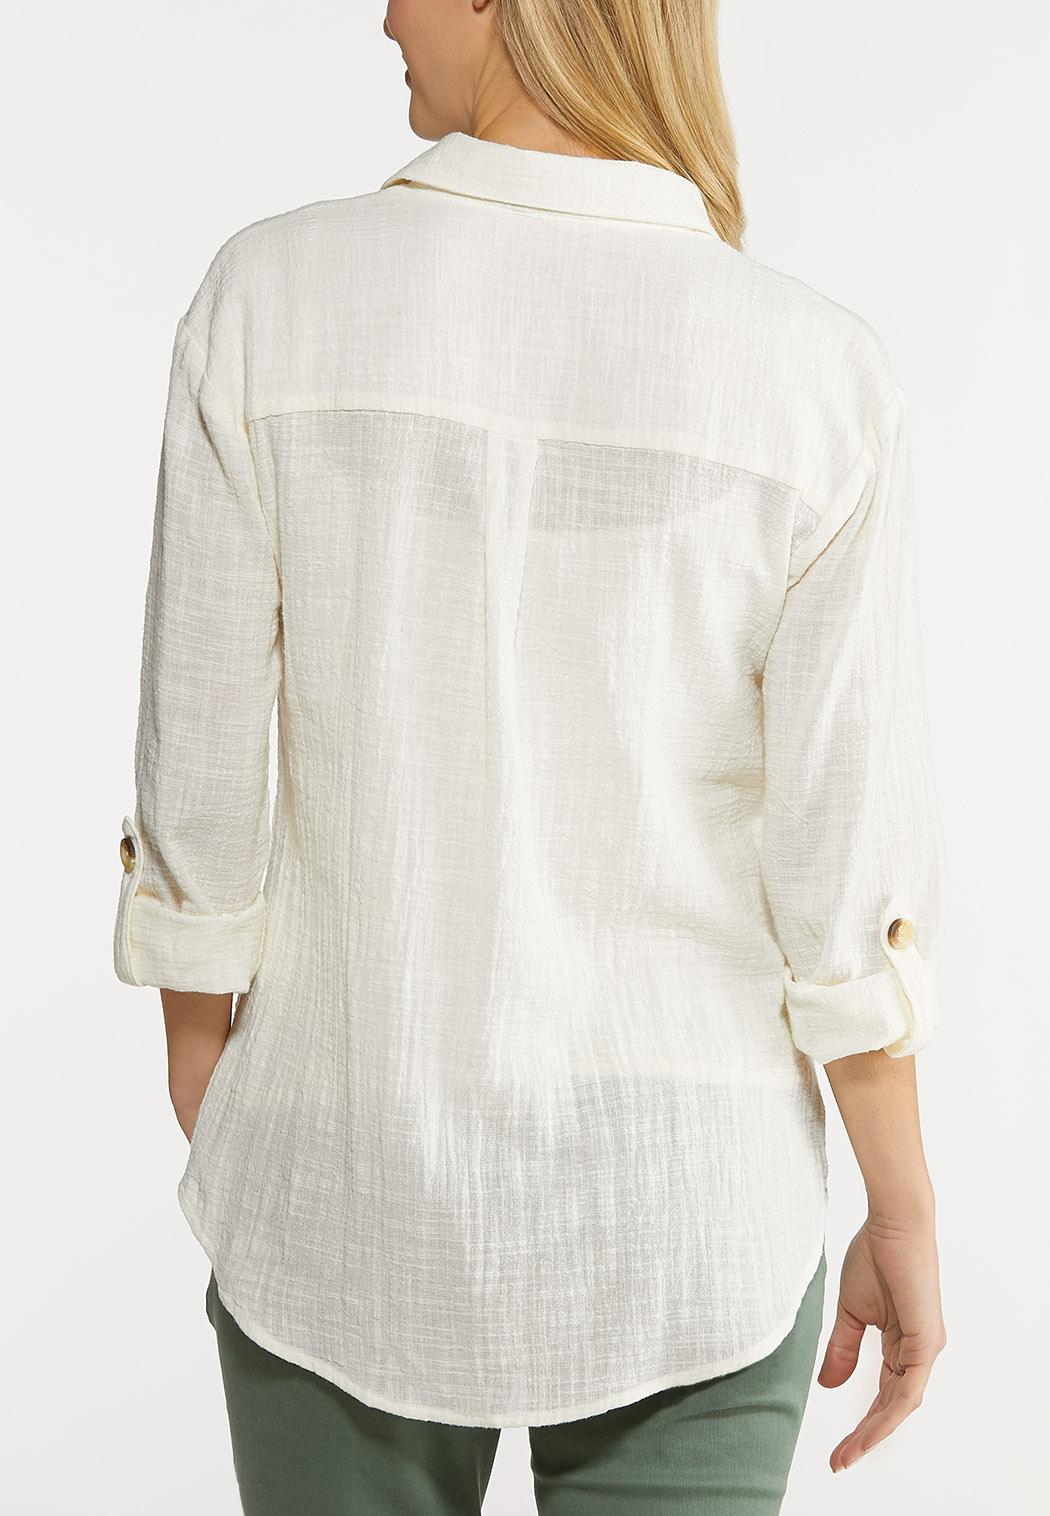 Plus Size Ivory Linen Top (Item #44093941)